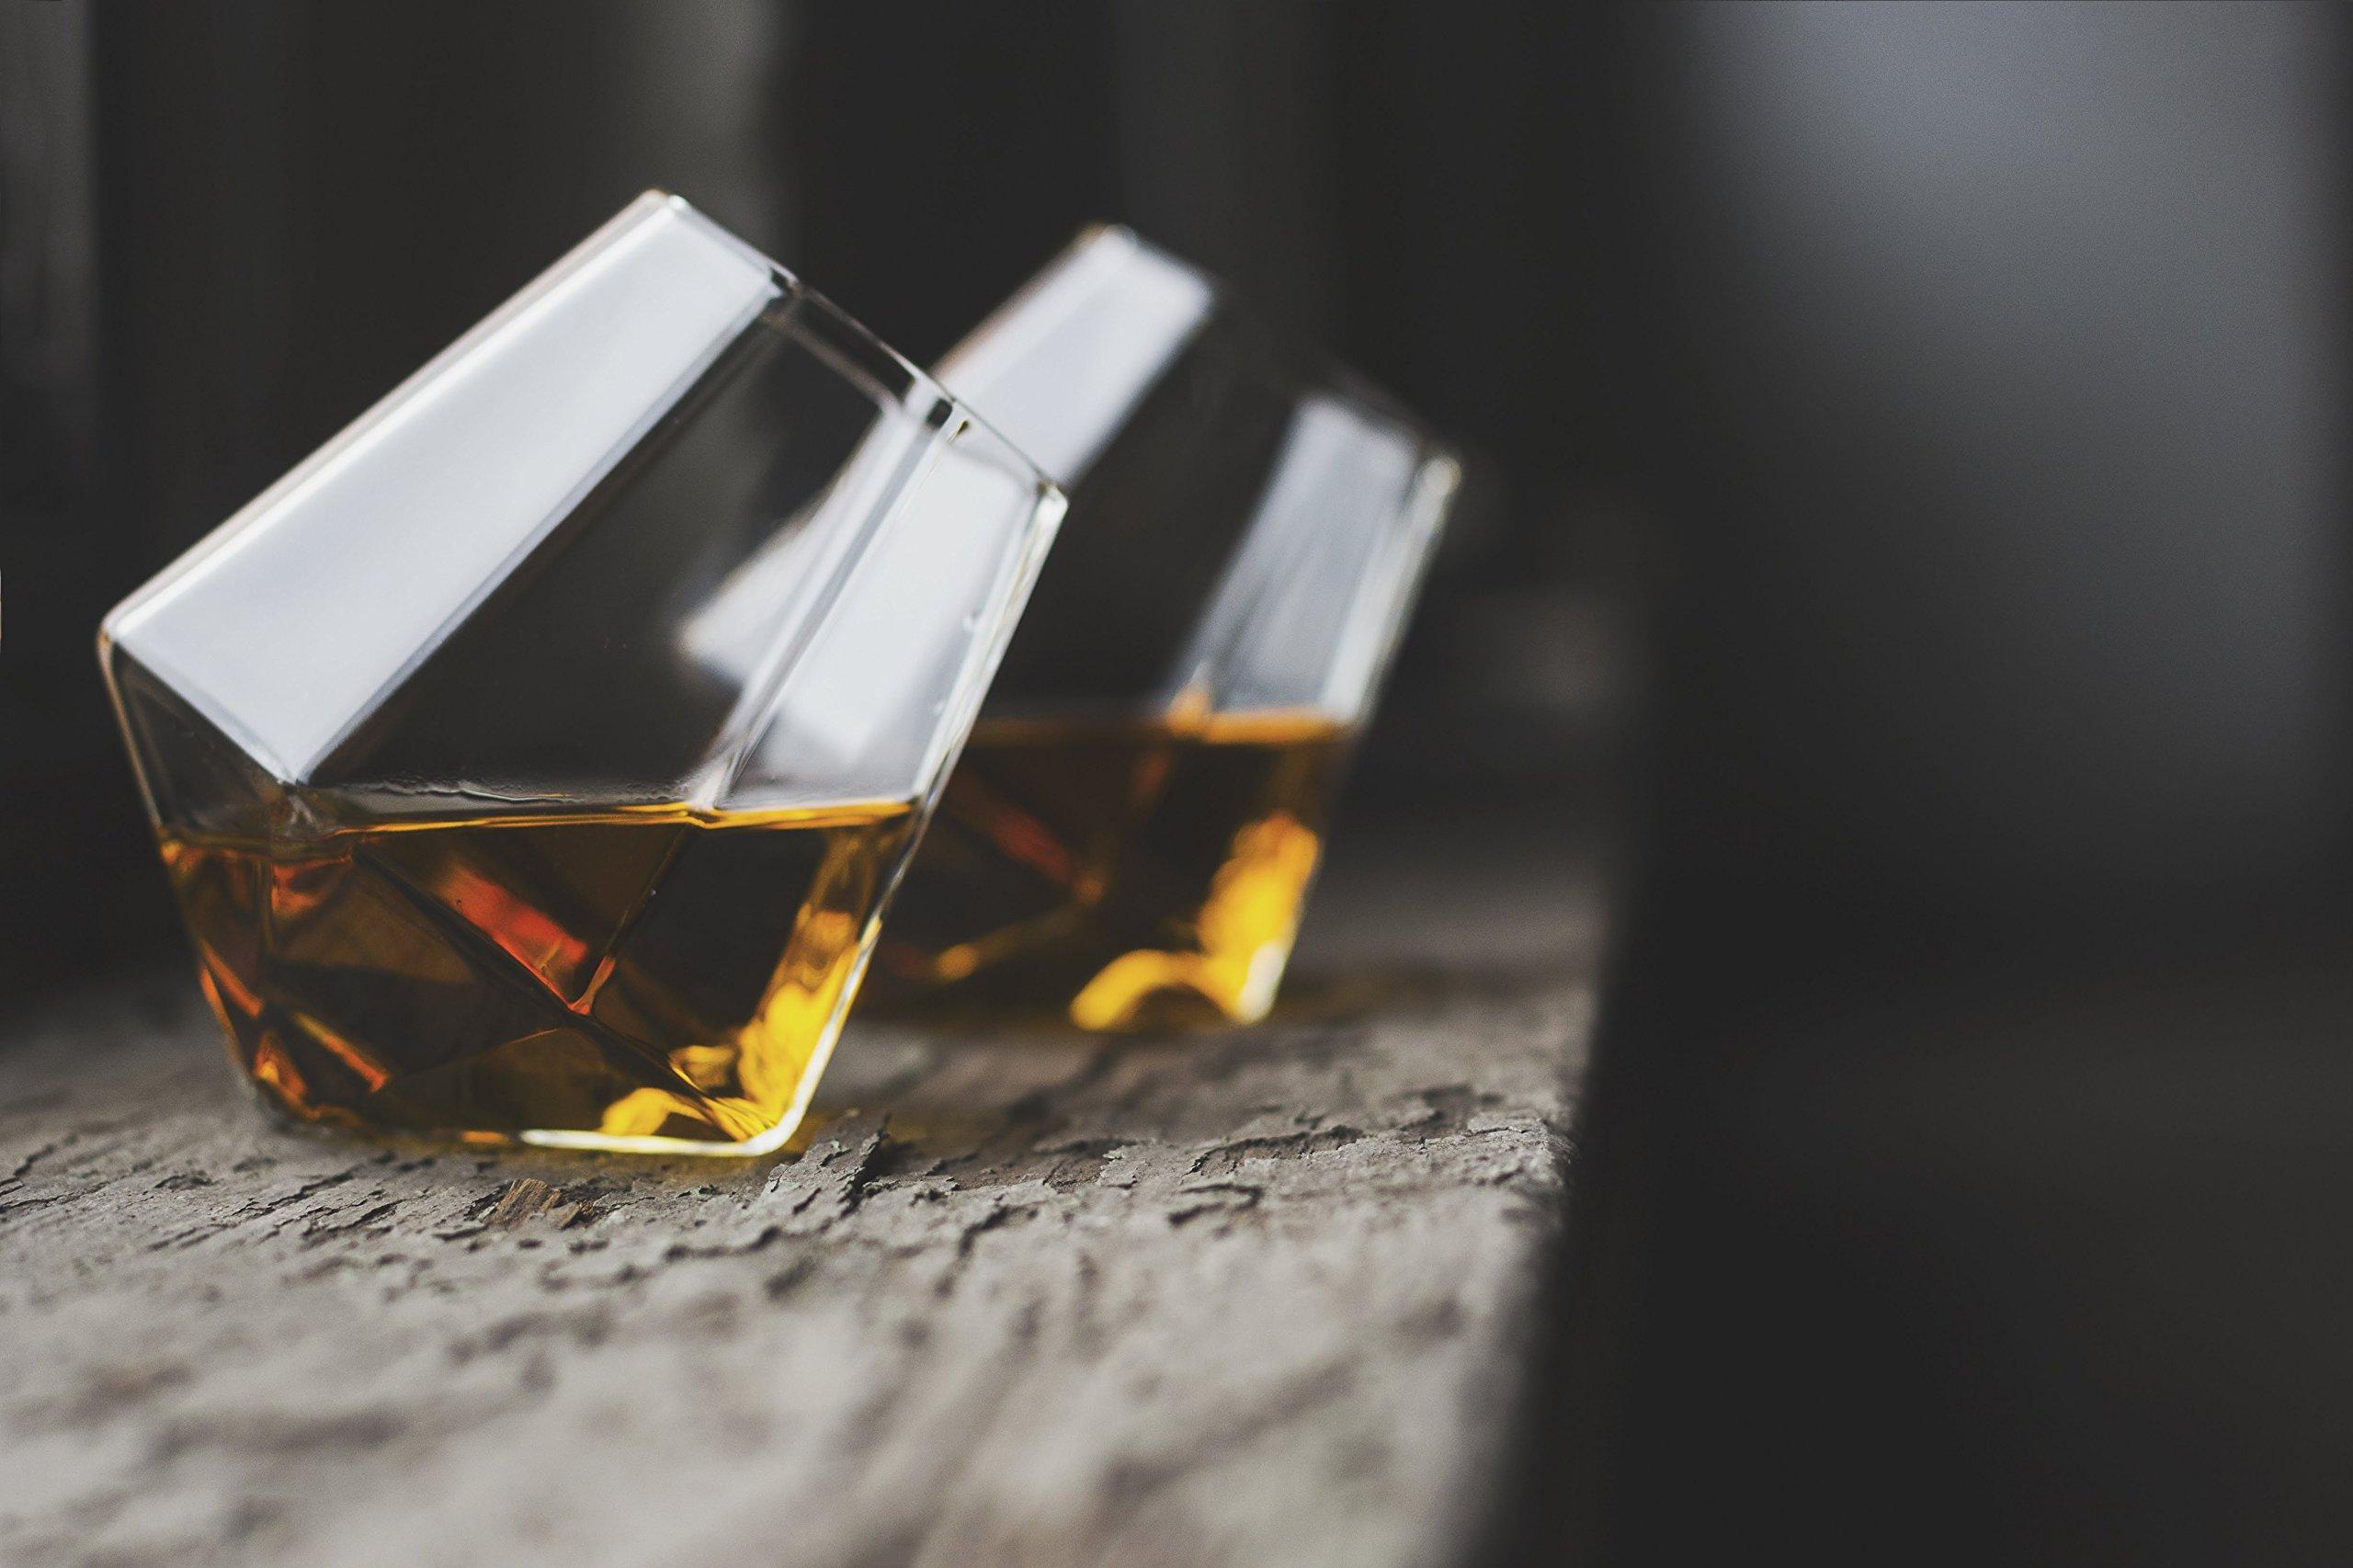 Dragon Glassware Diamond Whiskey Glasses, Premium Designer Tumblers for Spirits and Wine, 10-Ounces, Gift Boxed - Set of 4 by Dragon Glassware (Image #6)